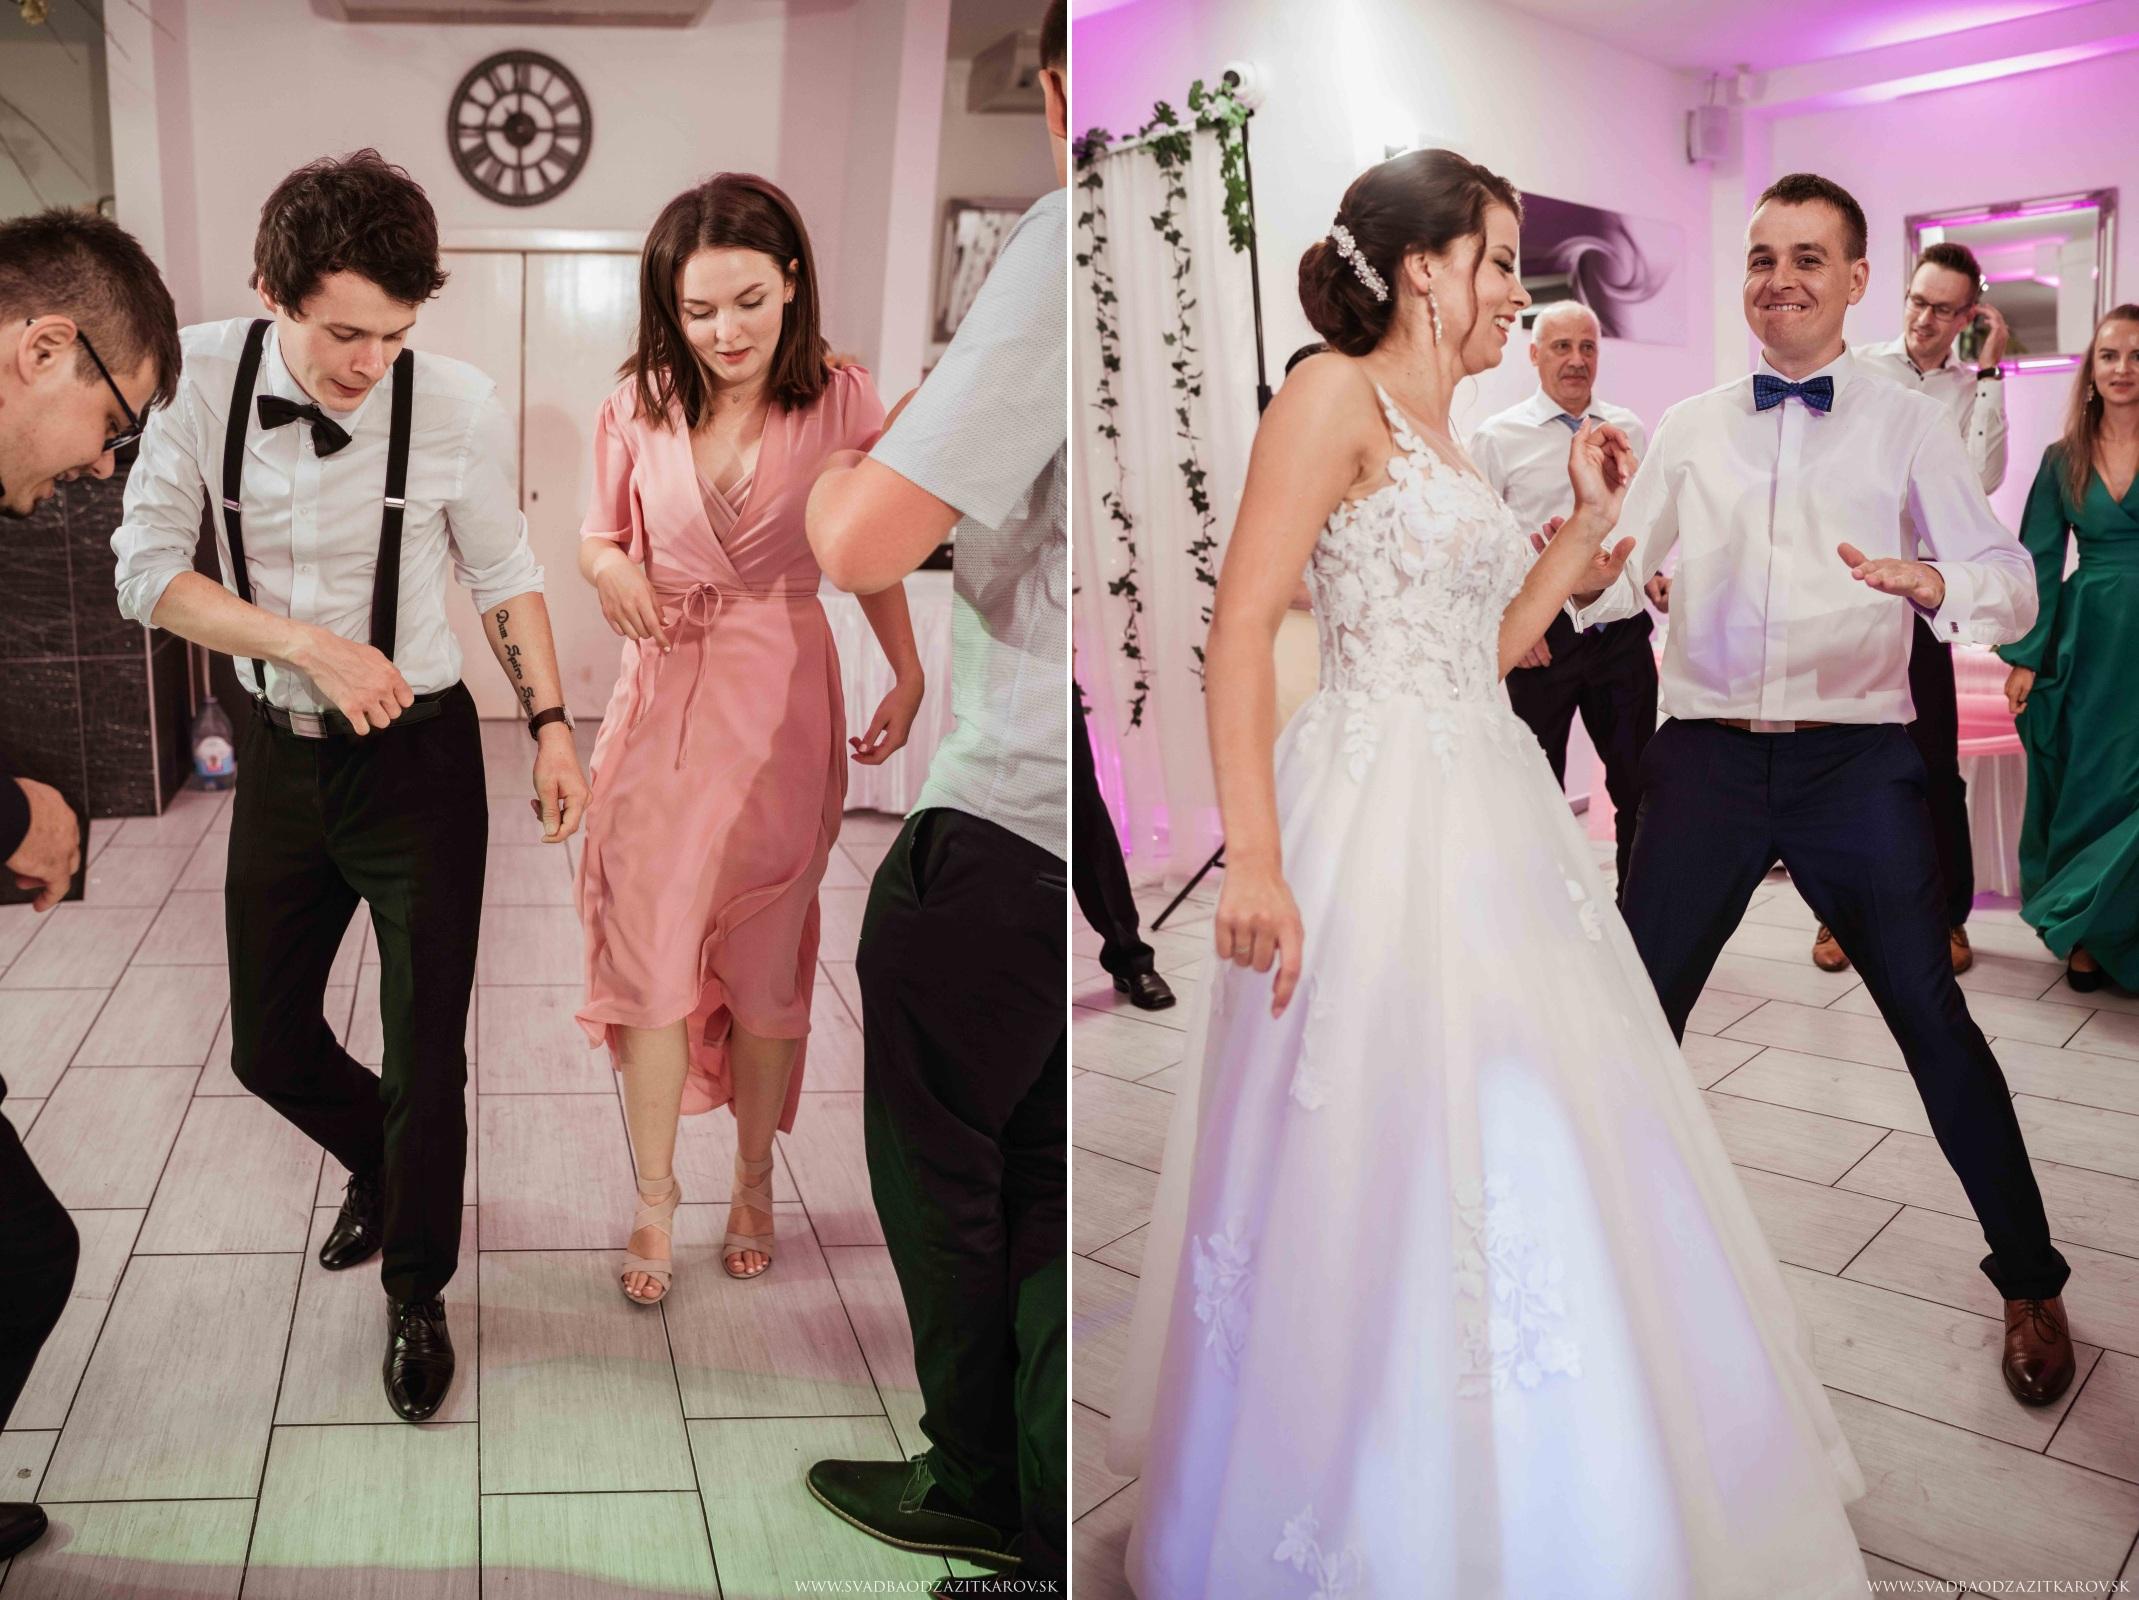 tanecna-zabava-svadbajpg